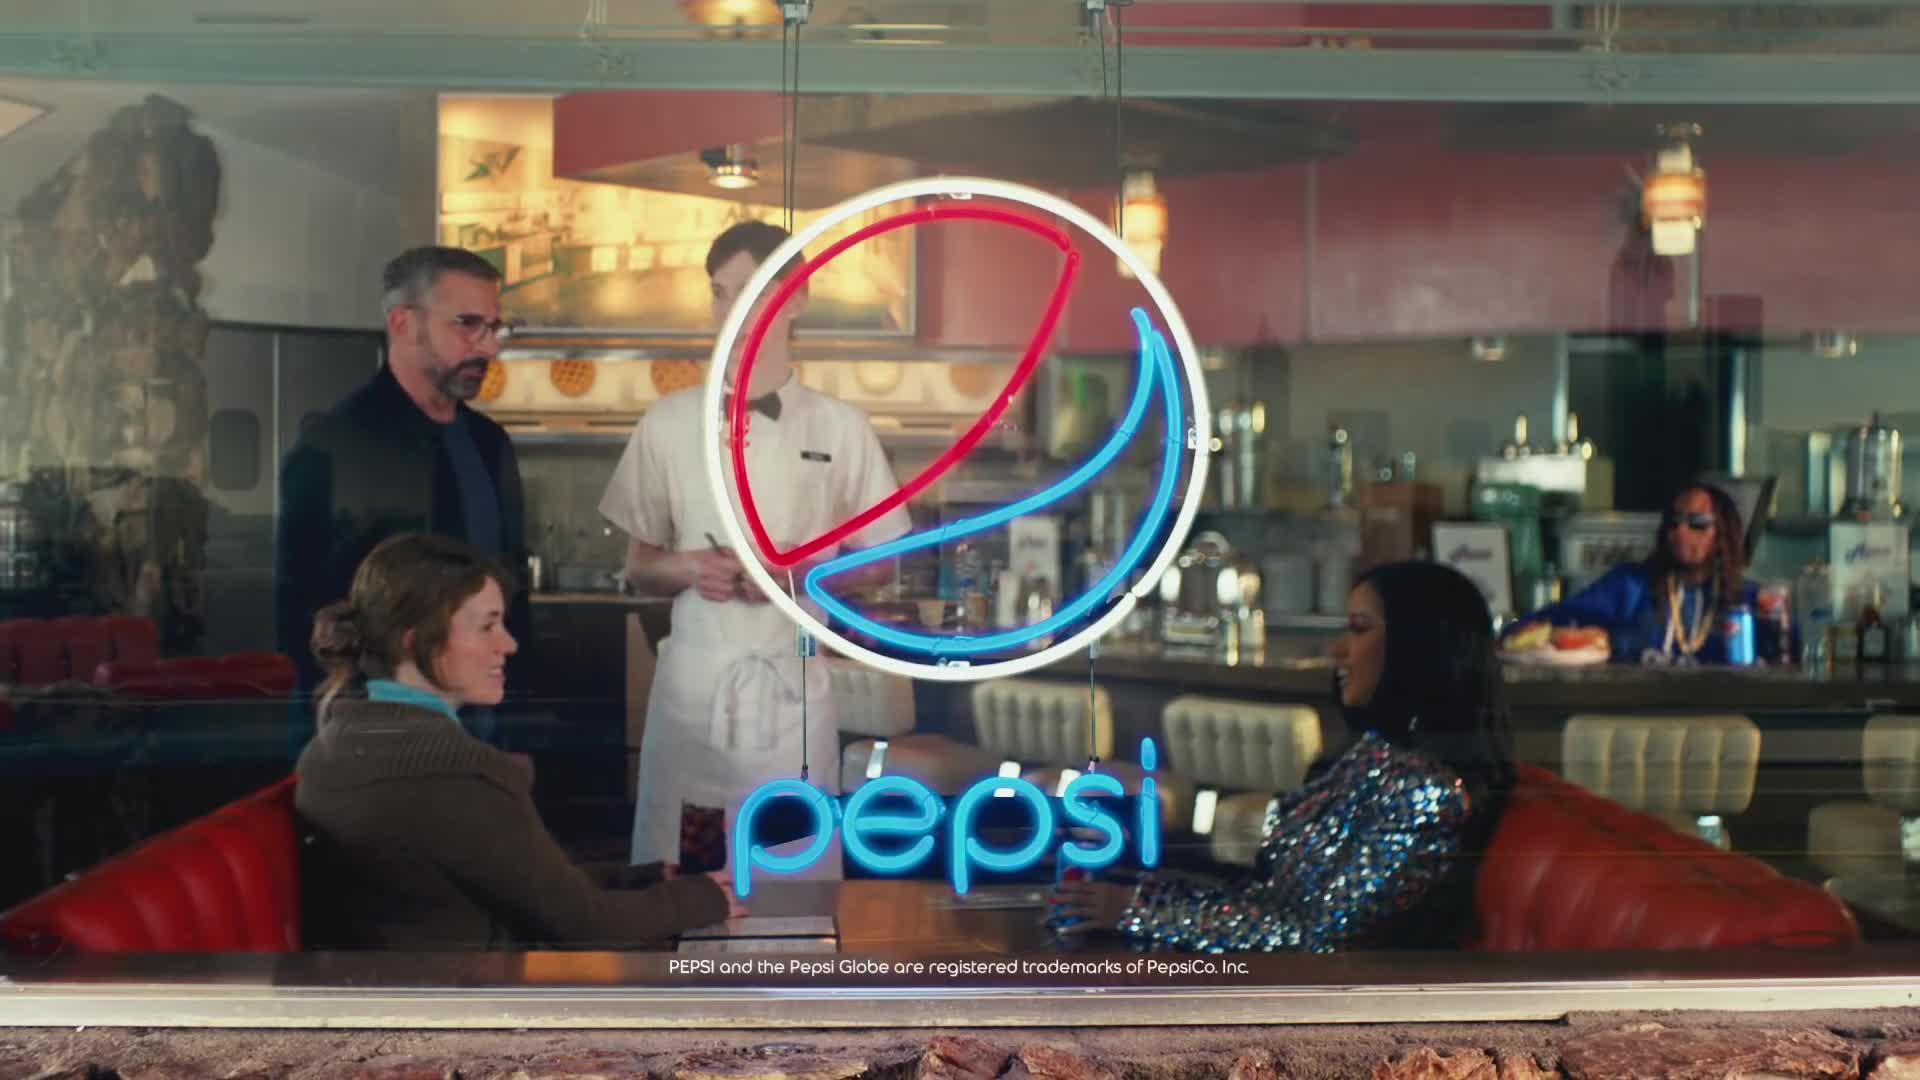 Werbespot, Super Bowl, Super Bowl 2019, Pepsi